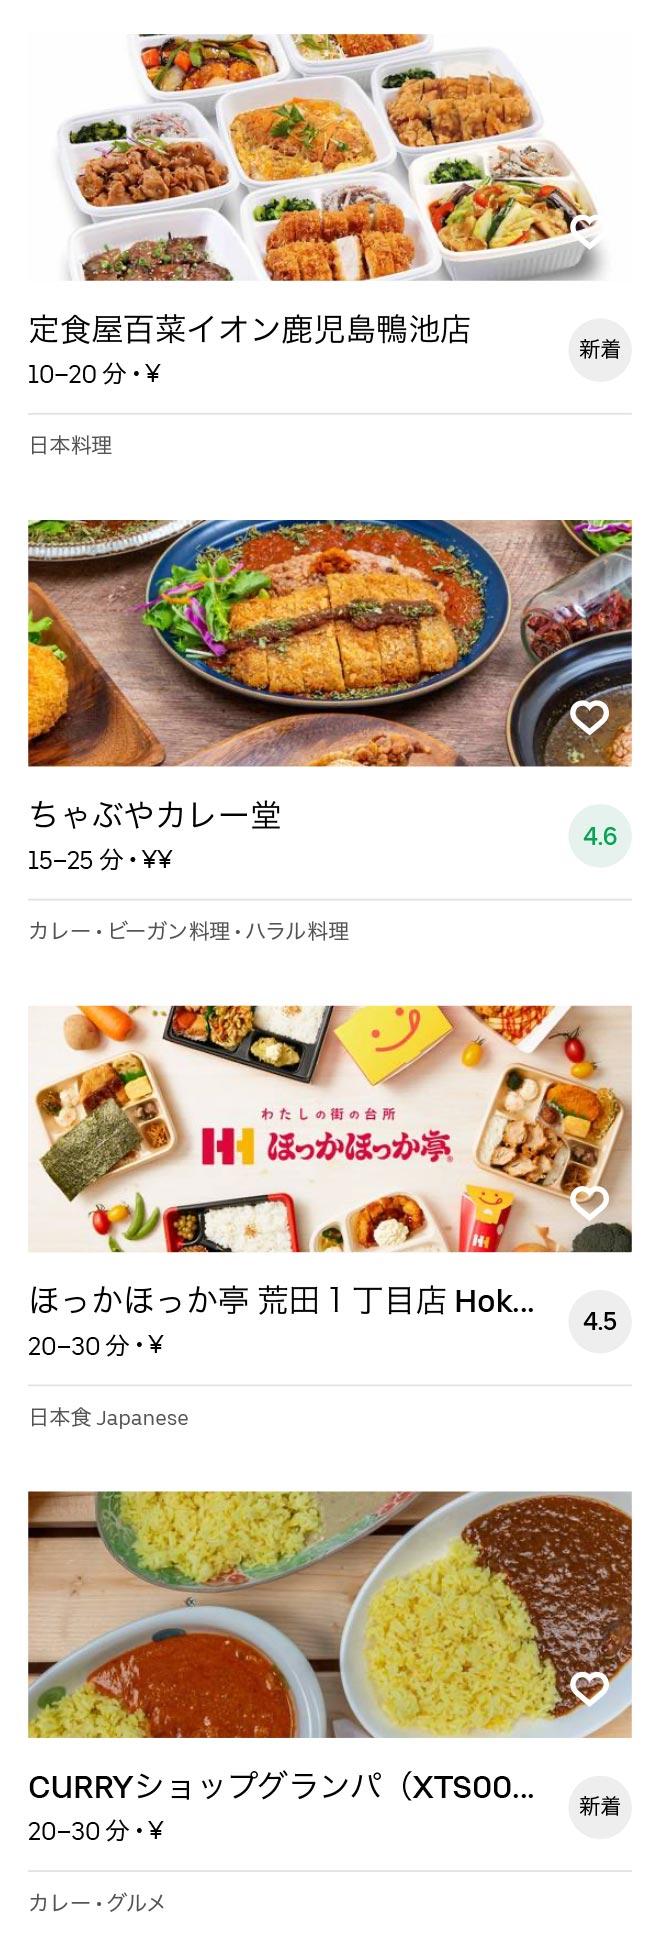 Korimoto menu 2009 2